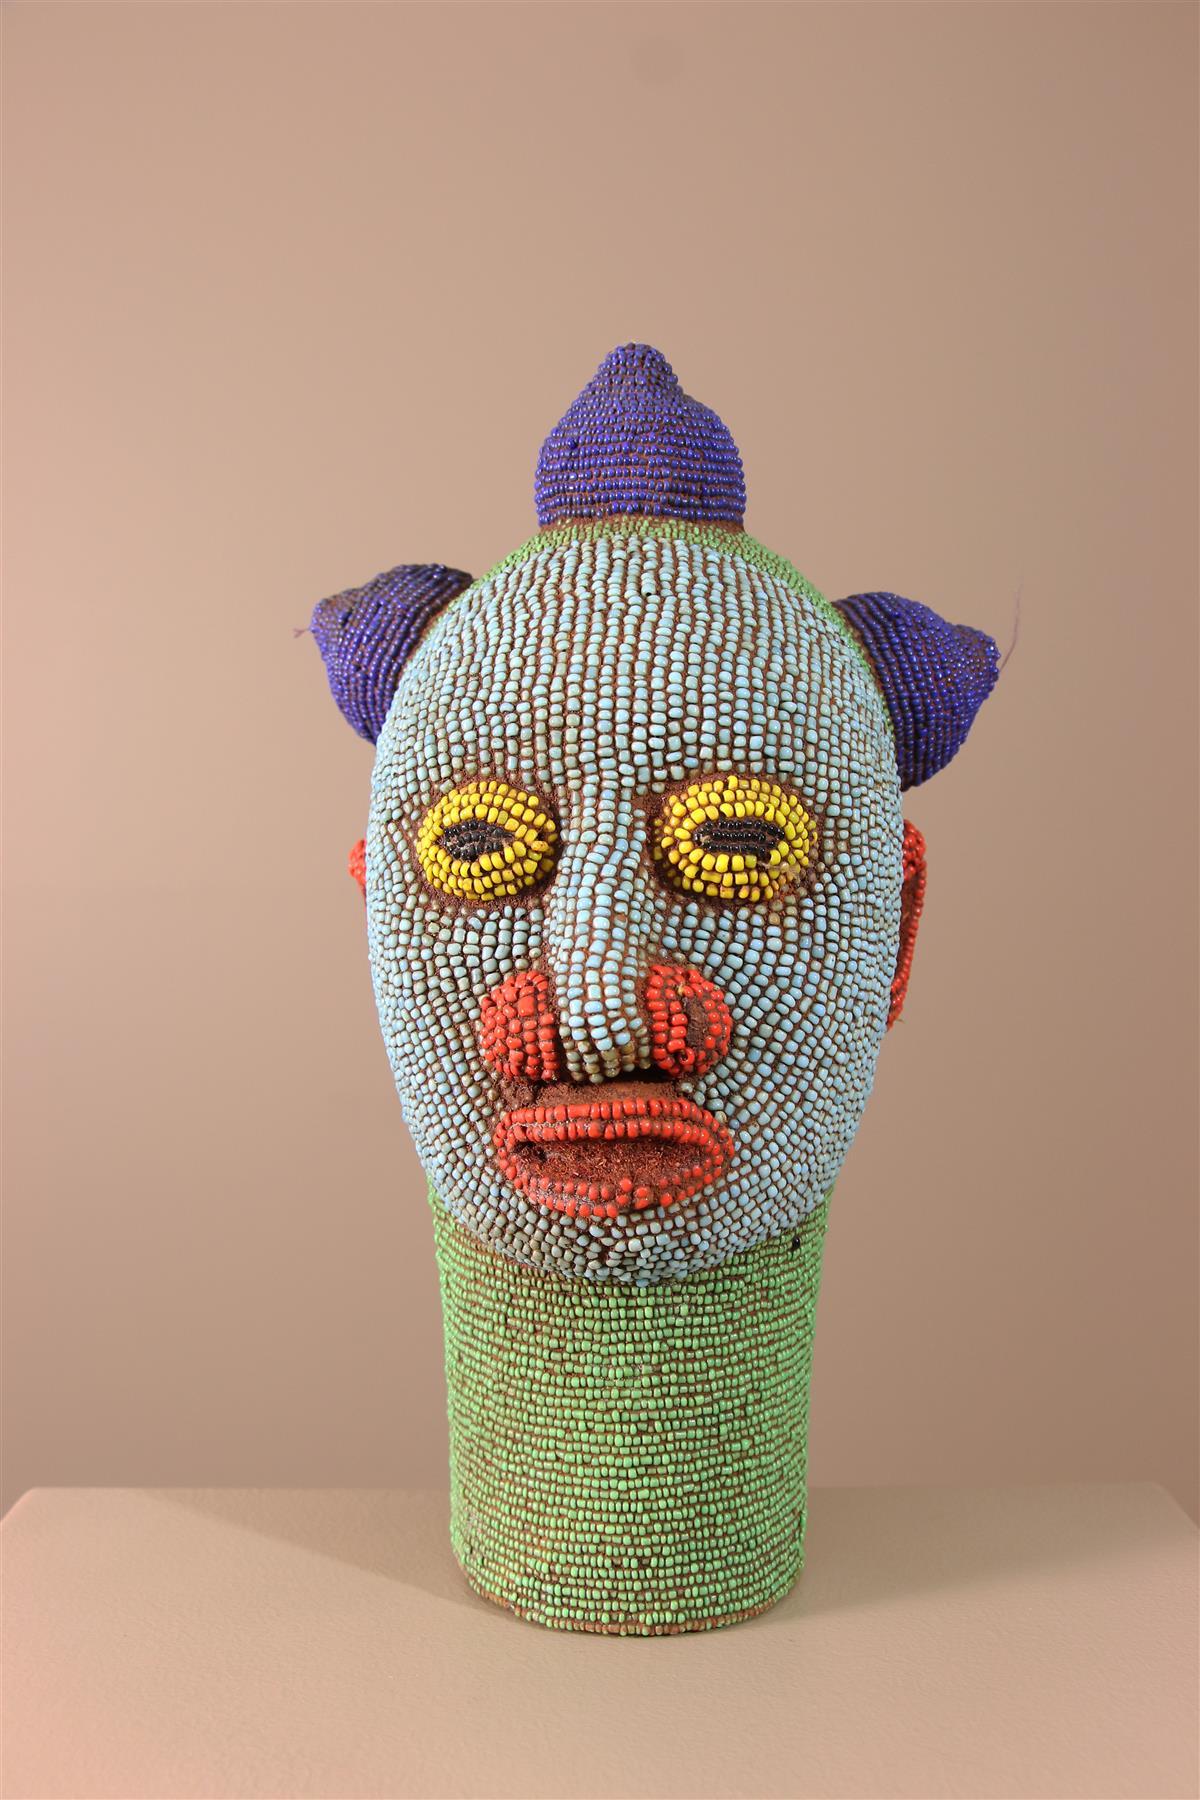 Tête perlée - Déco africaine - Art africain traditionnel